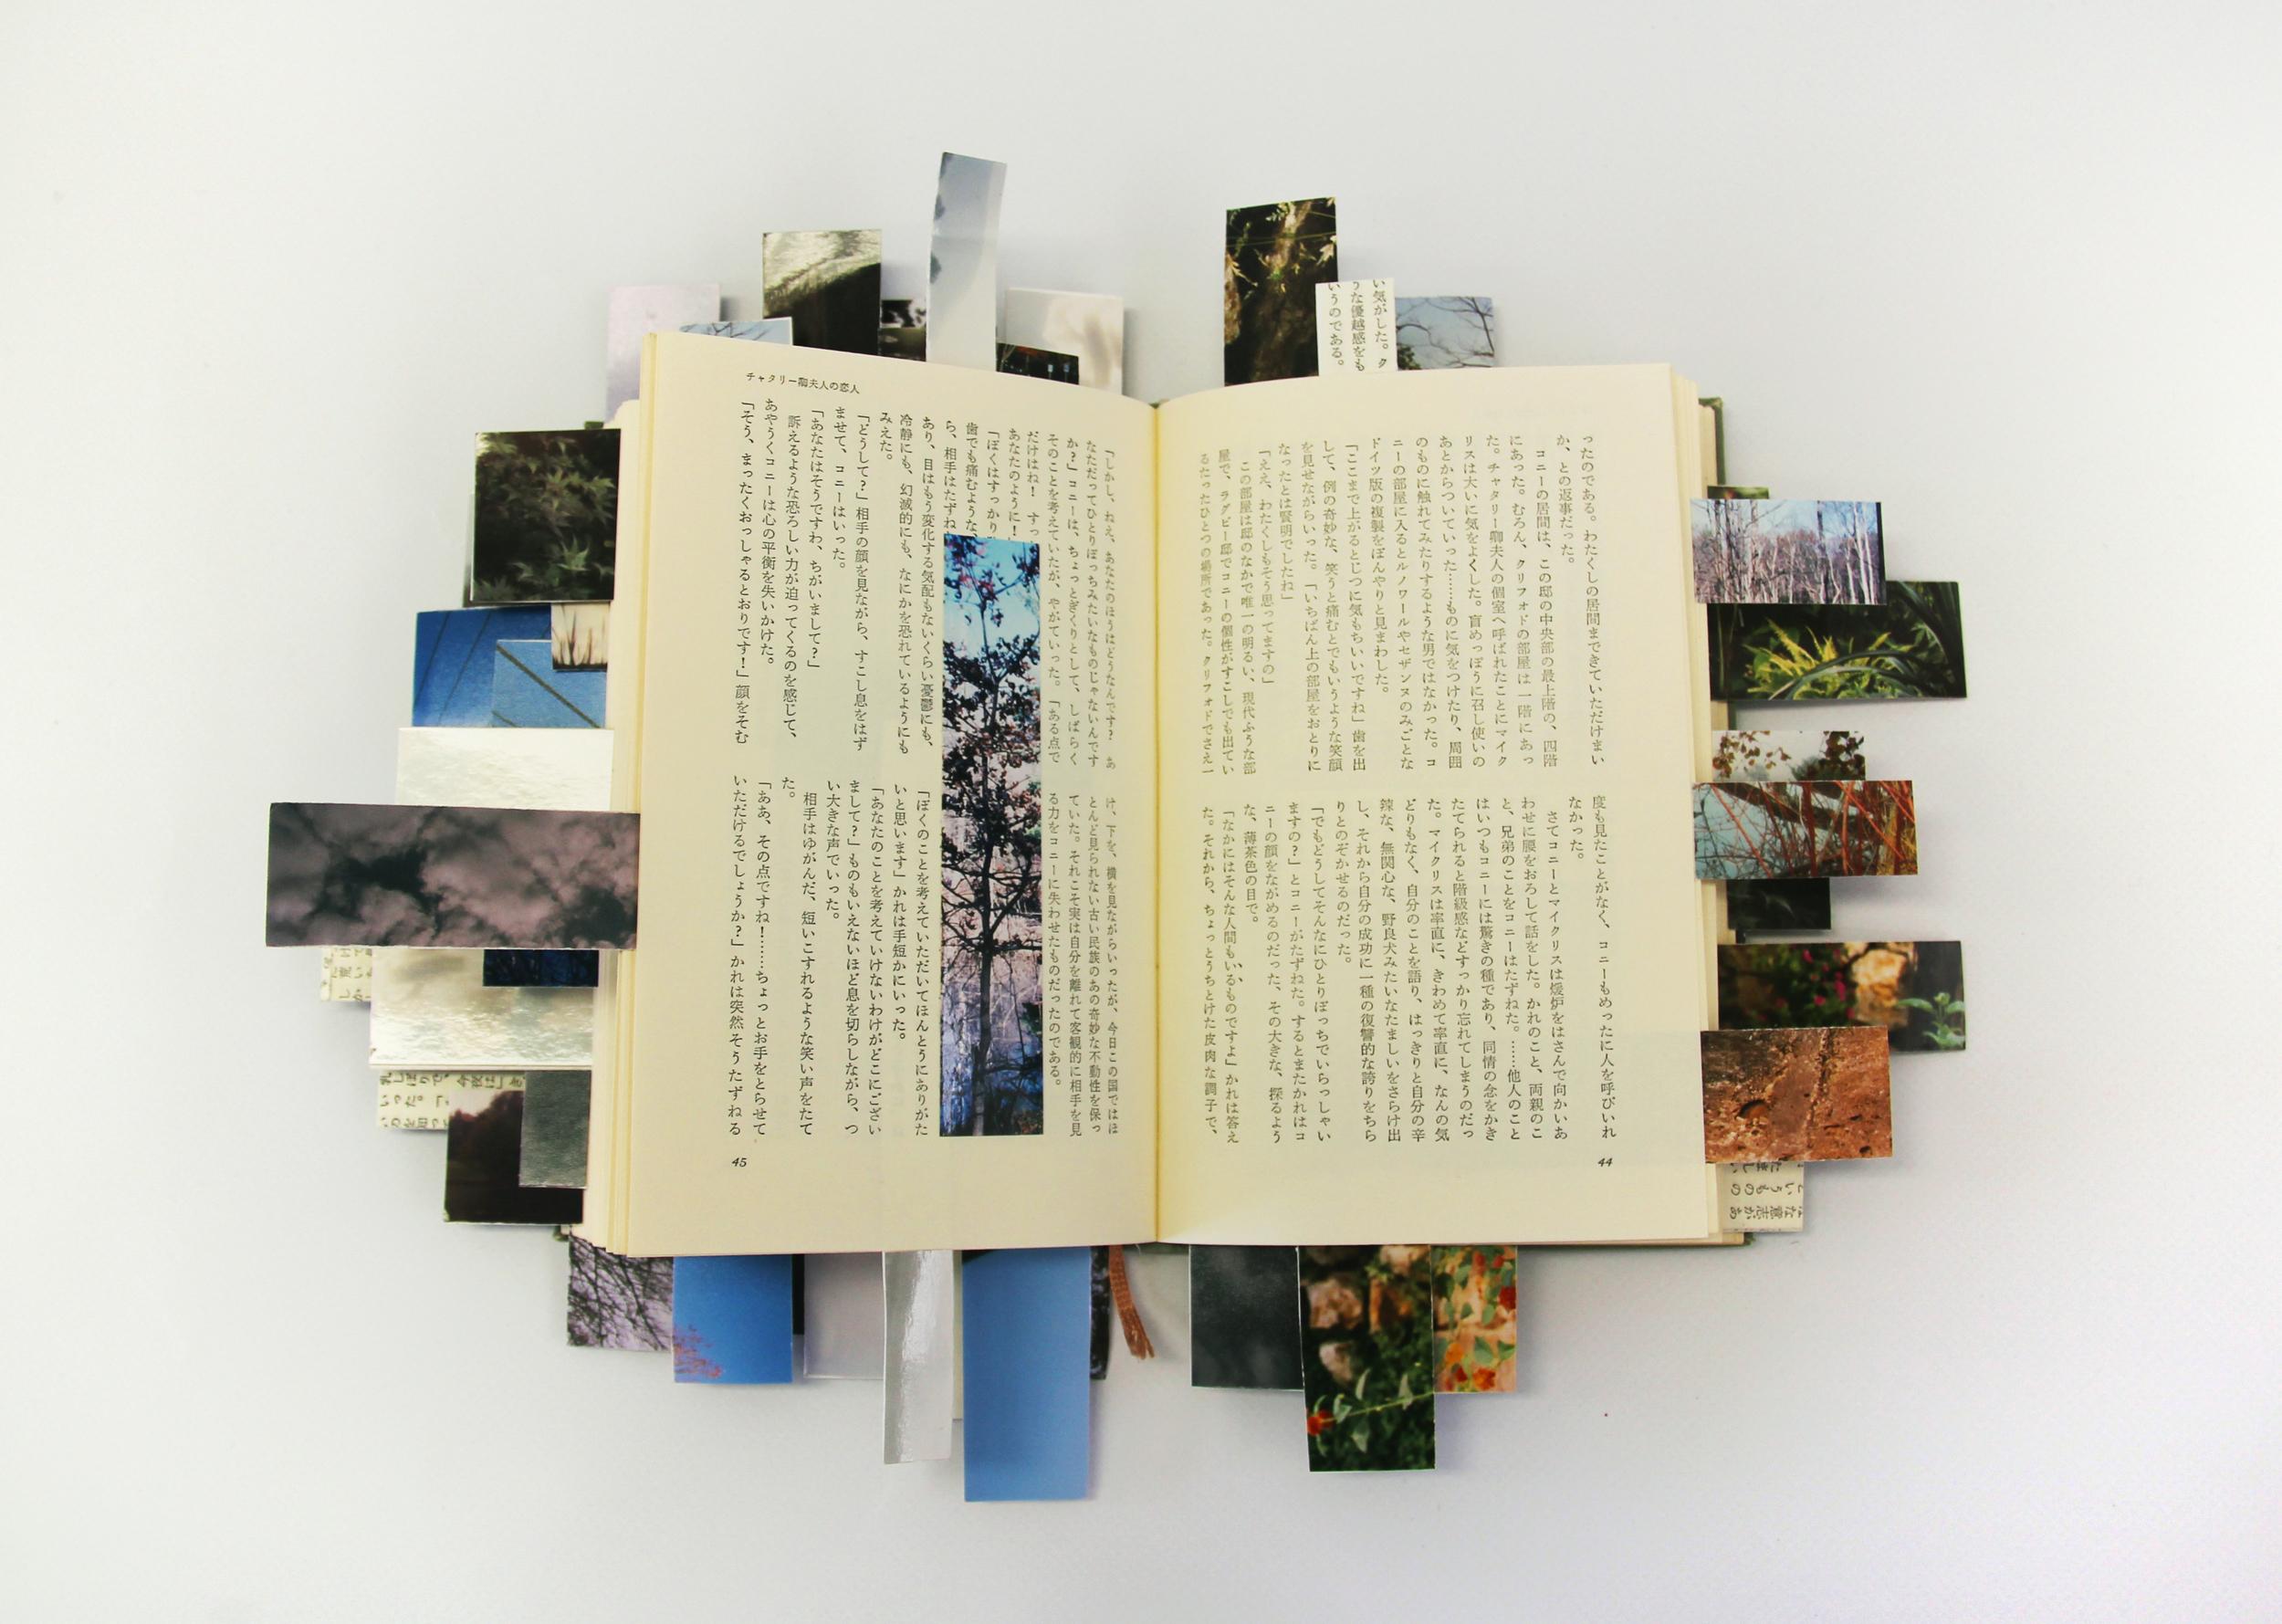 JuliaNelsonGal_GreetingsFromKalamazoo,Book1_FoundBookFoundPhotos_12x12inches.jpg